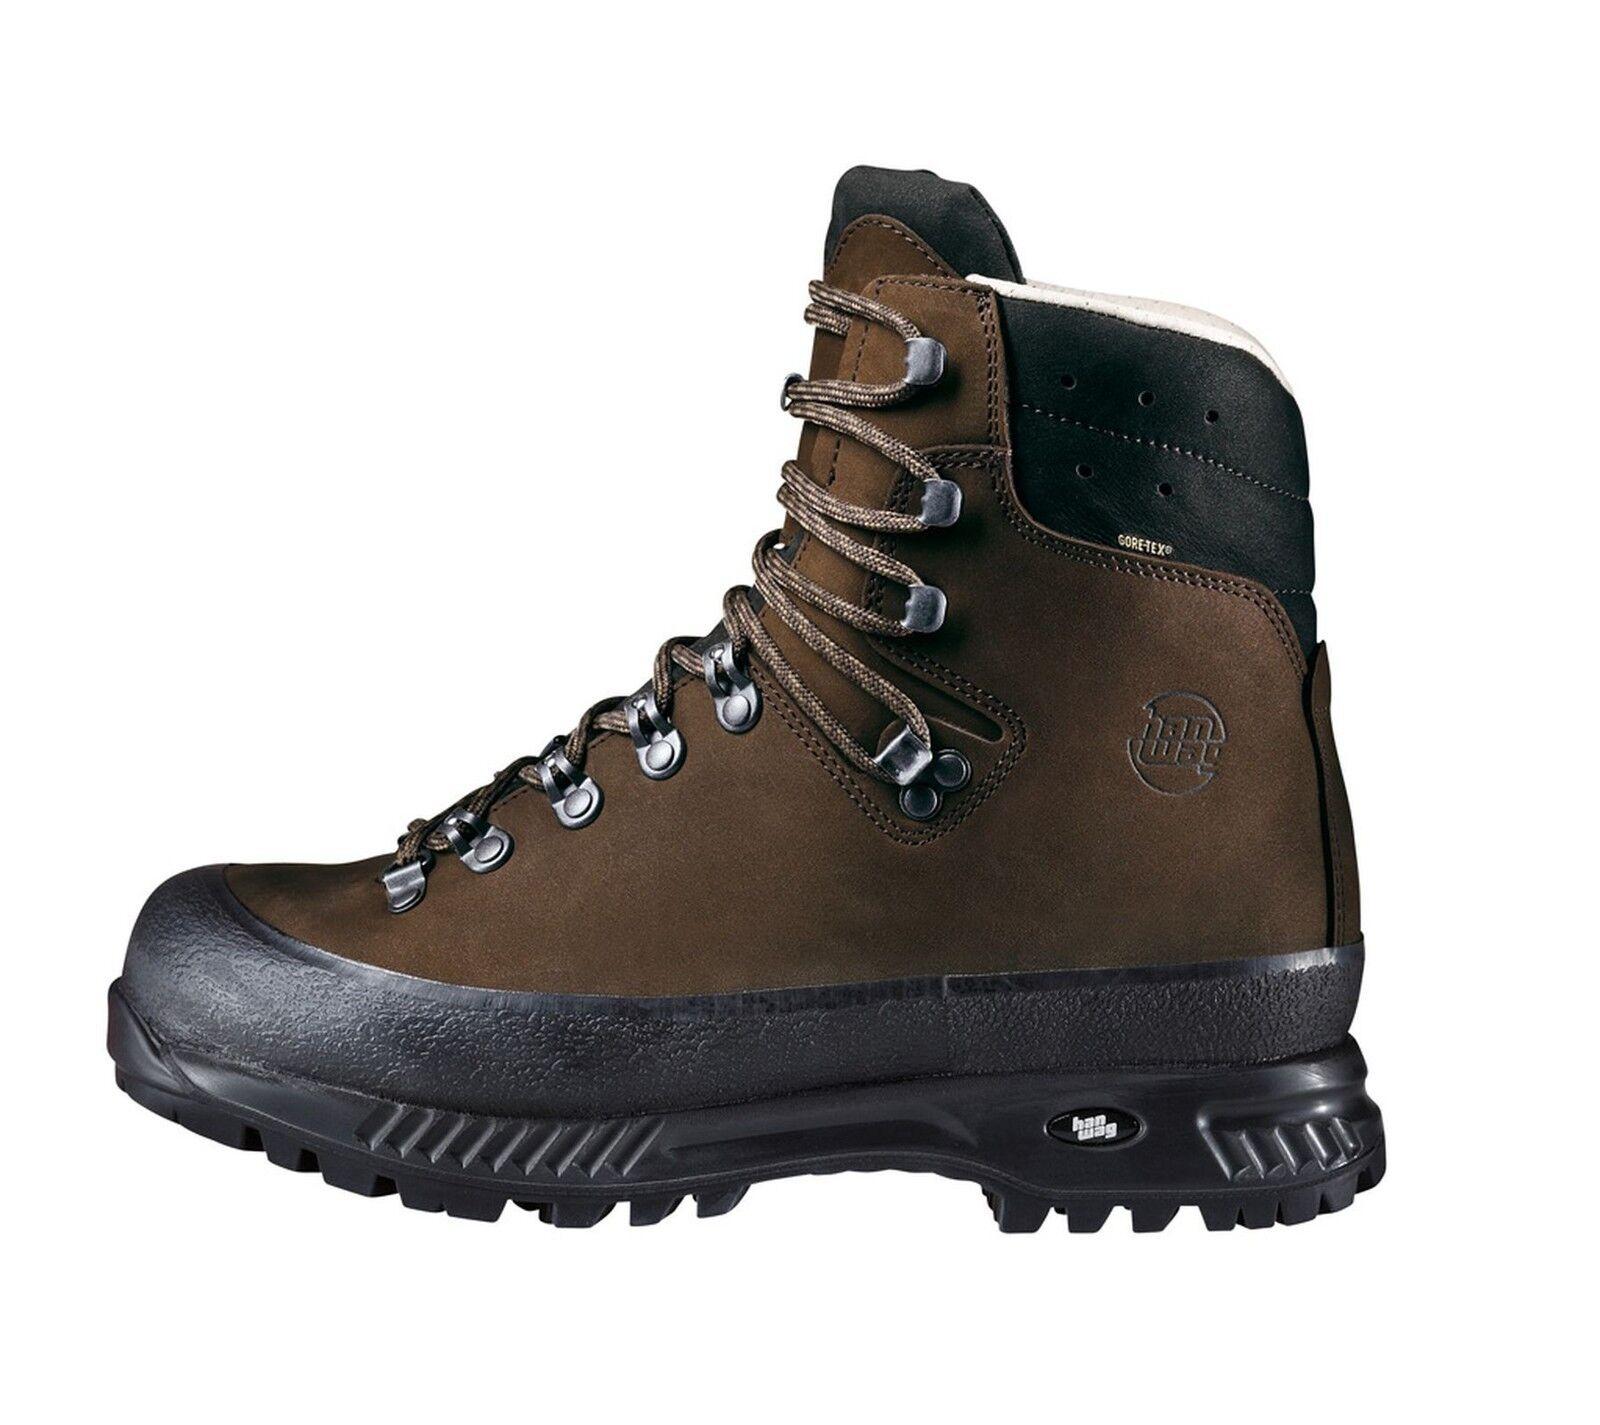 Hanwag zapatos de montaña  alaska Wide GTX Men tamaño 9,5 - tierra 44